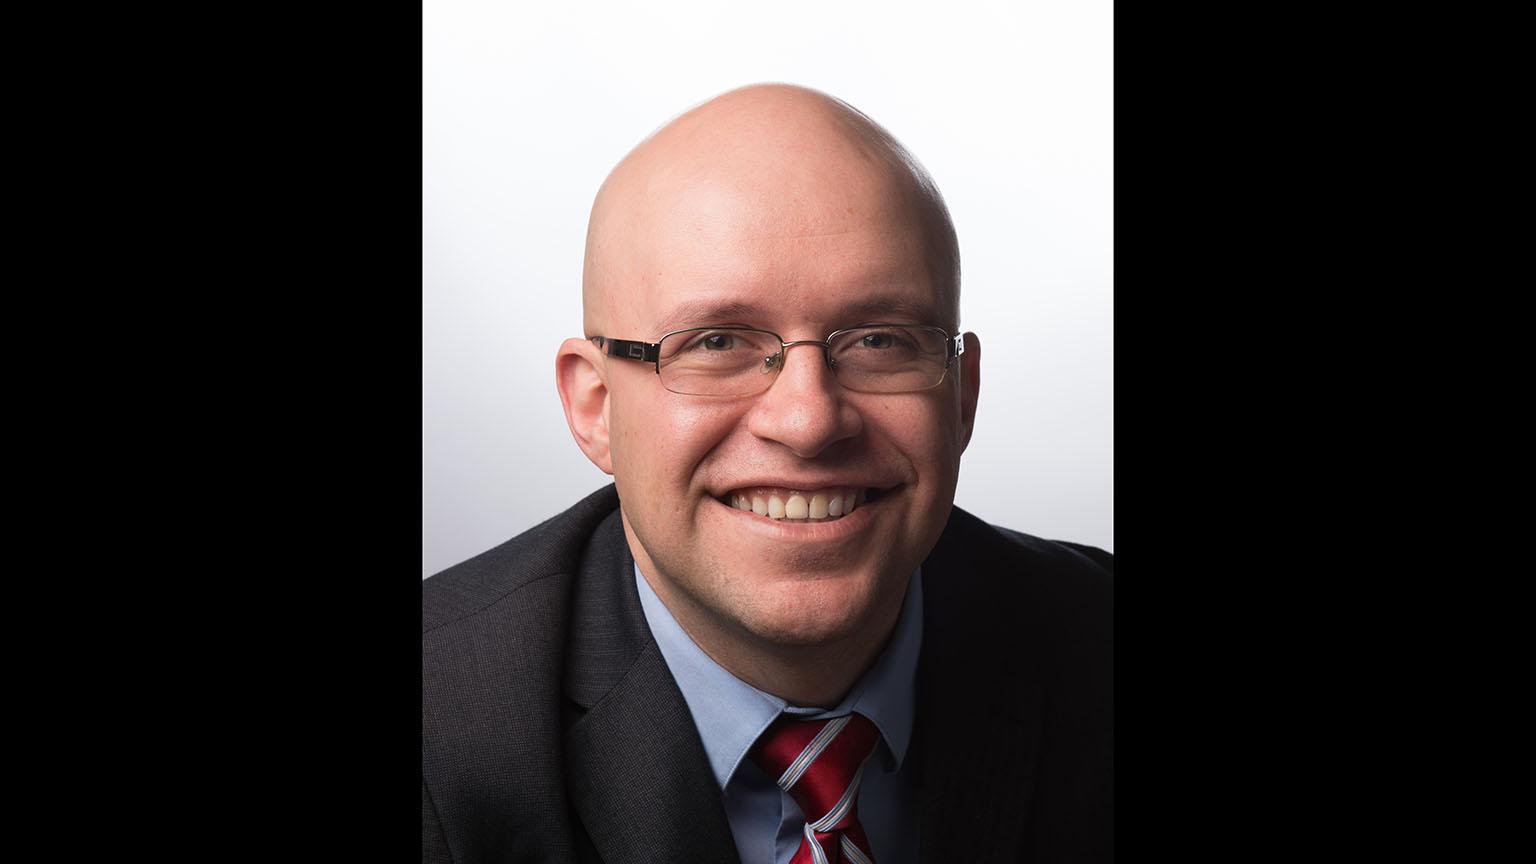 22nd Ward Candidate For Alderman